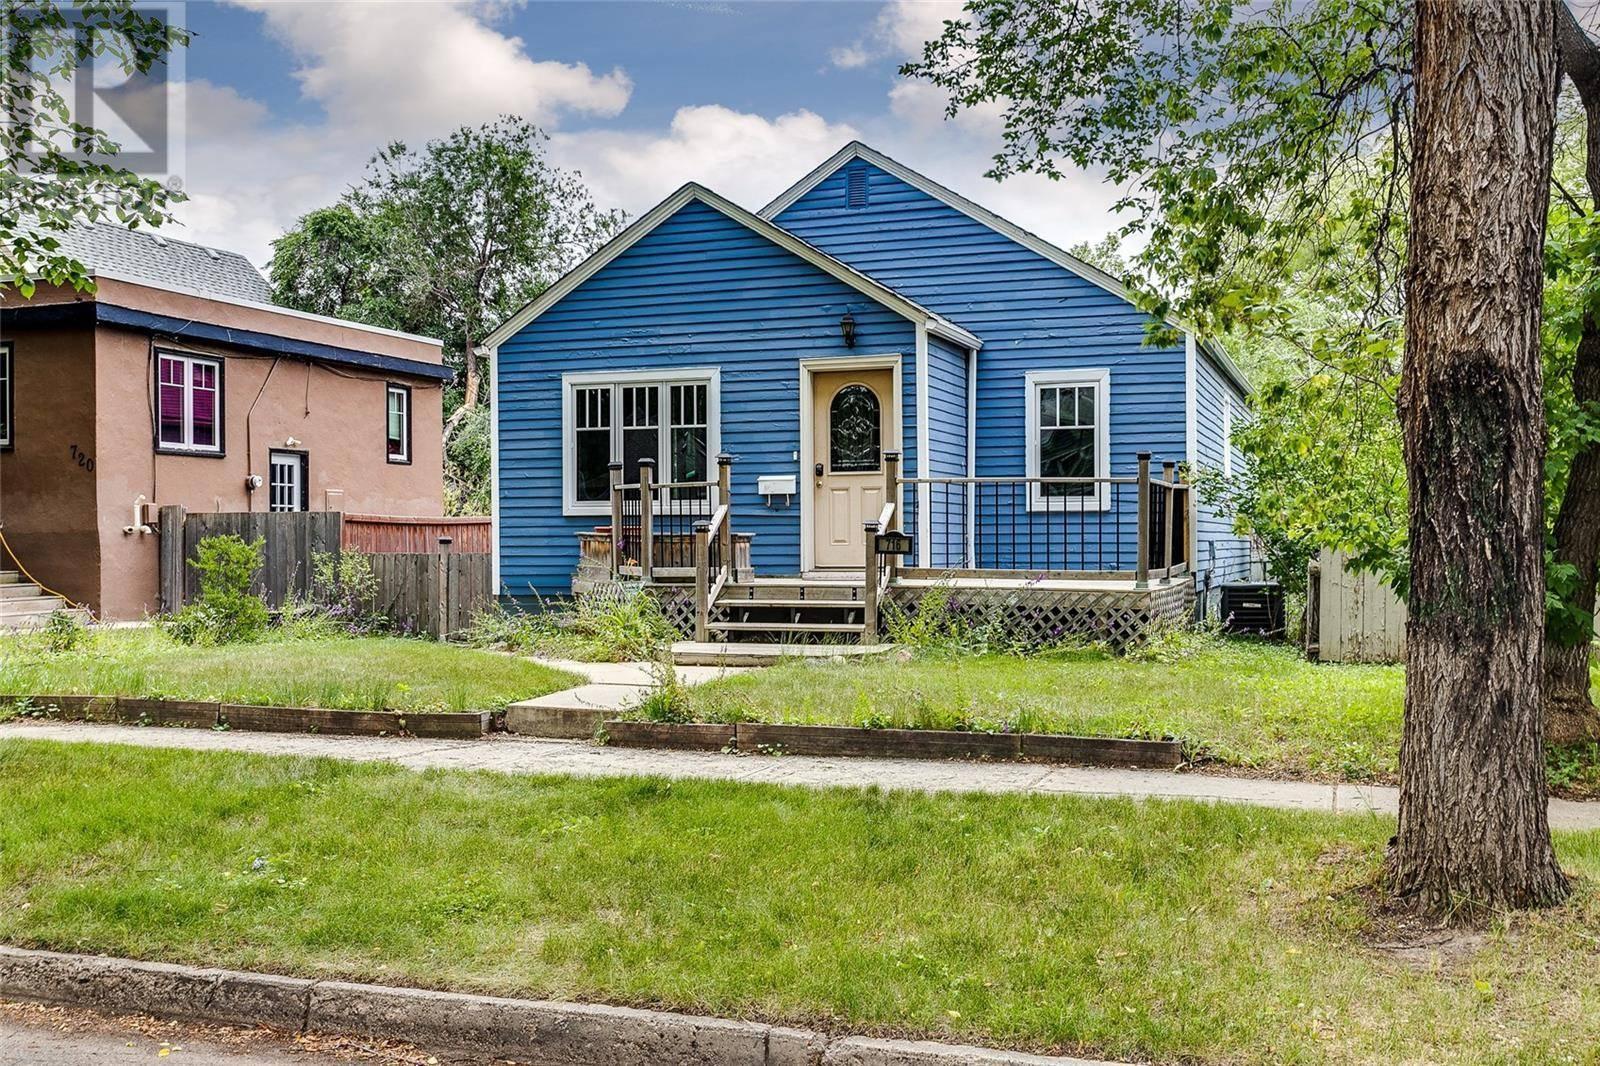 House for sale at 716 6th St E Saskatoon Saskatchewan - MLS: SK783385